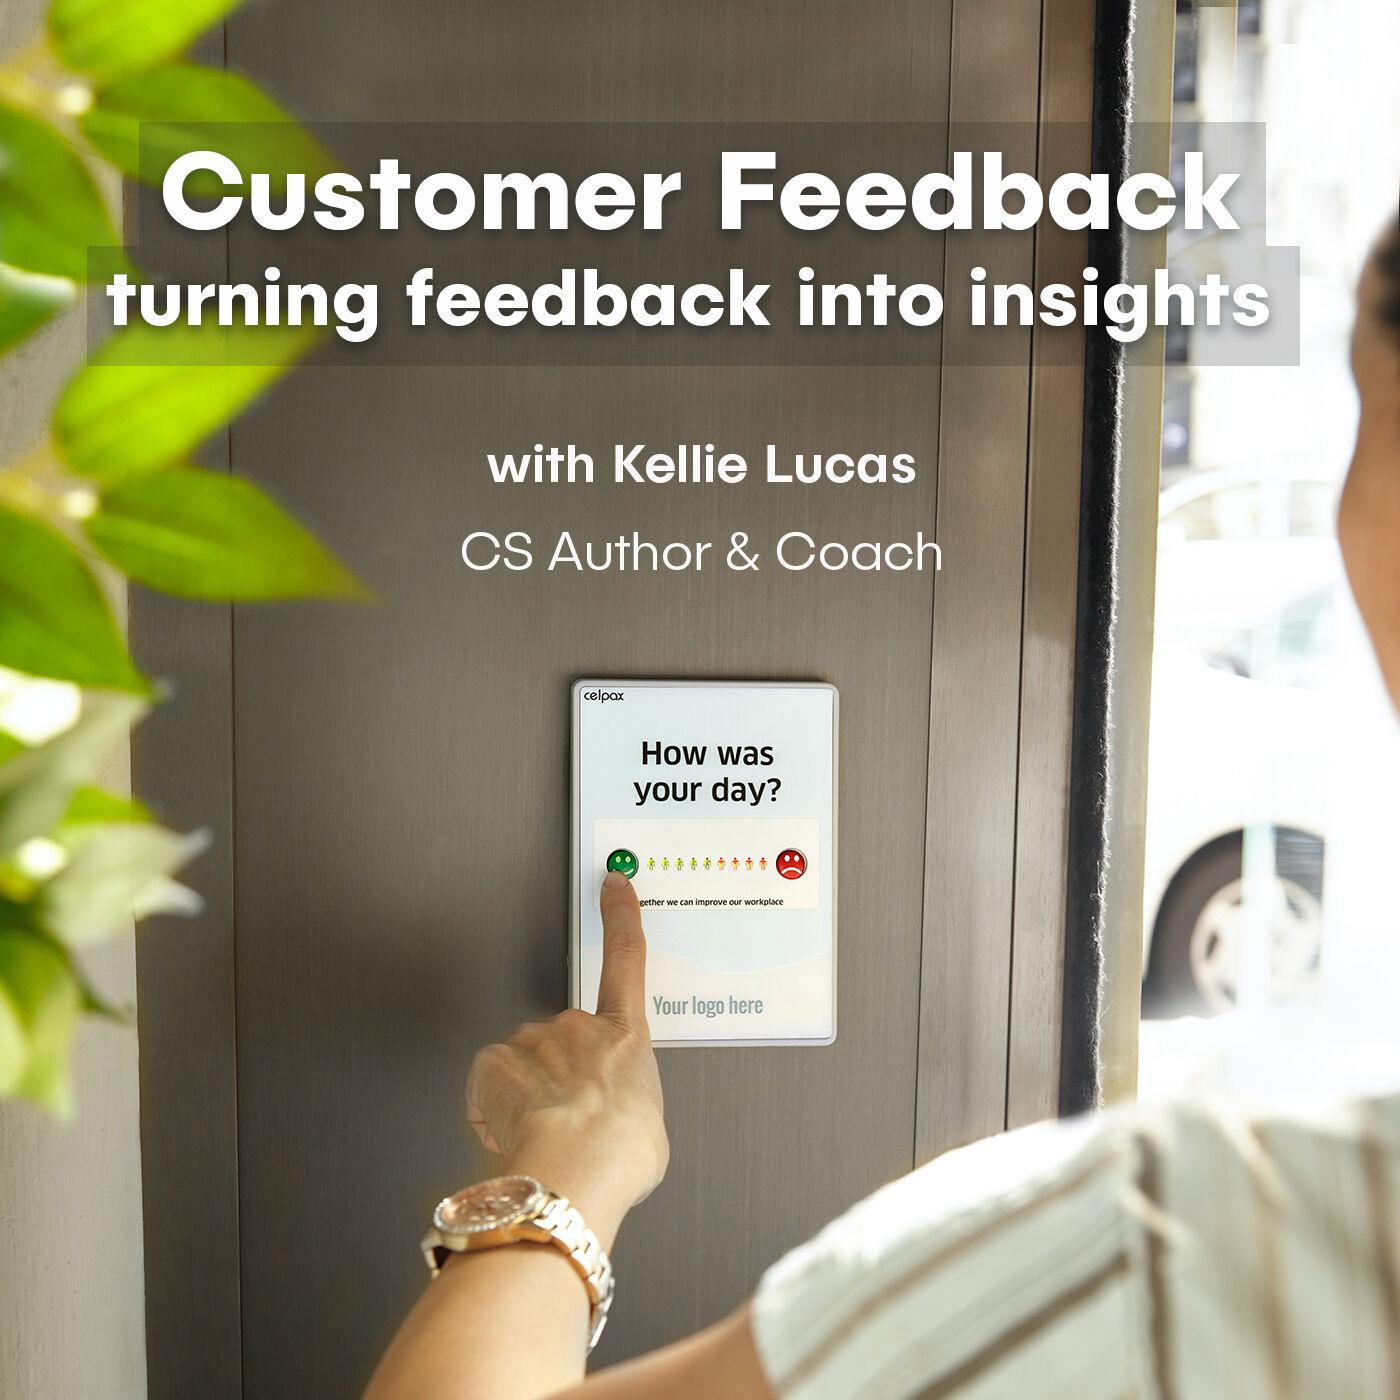 Kellie Lucas, CS Author & Coach - Customer feedback, turning feedback into insights